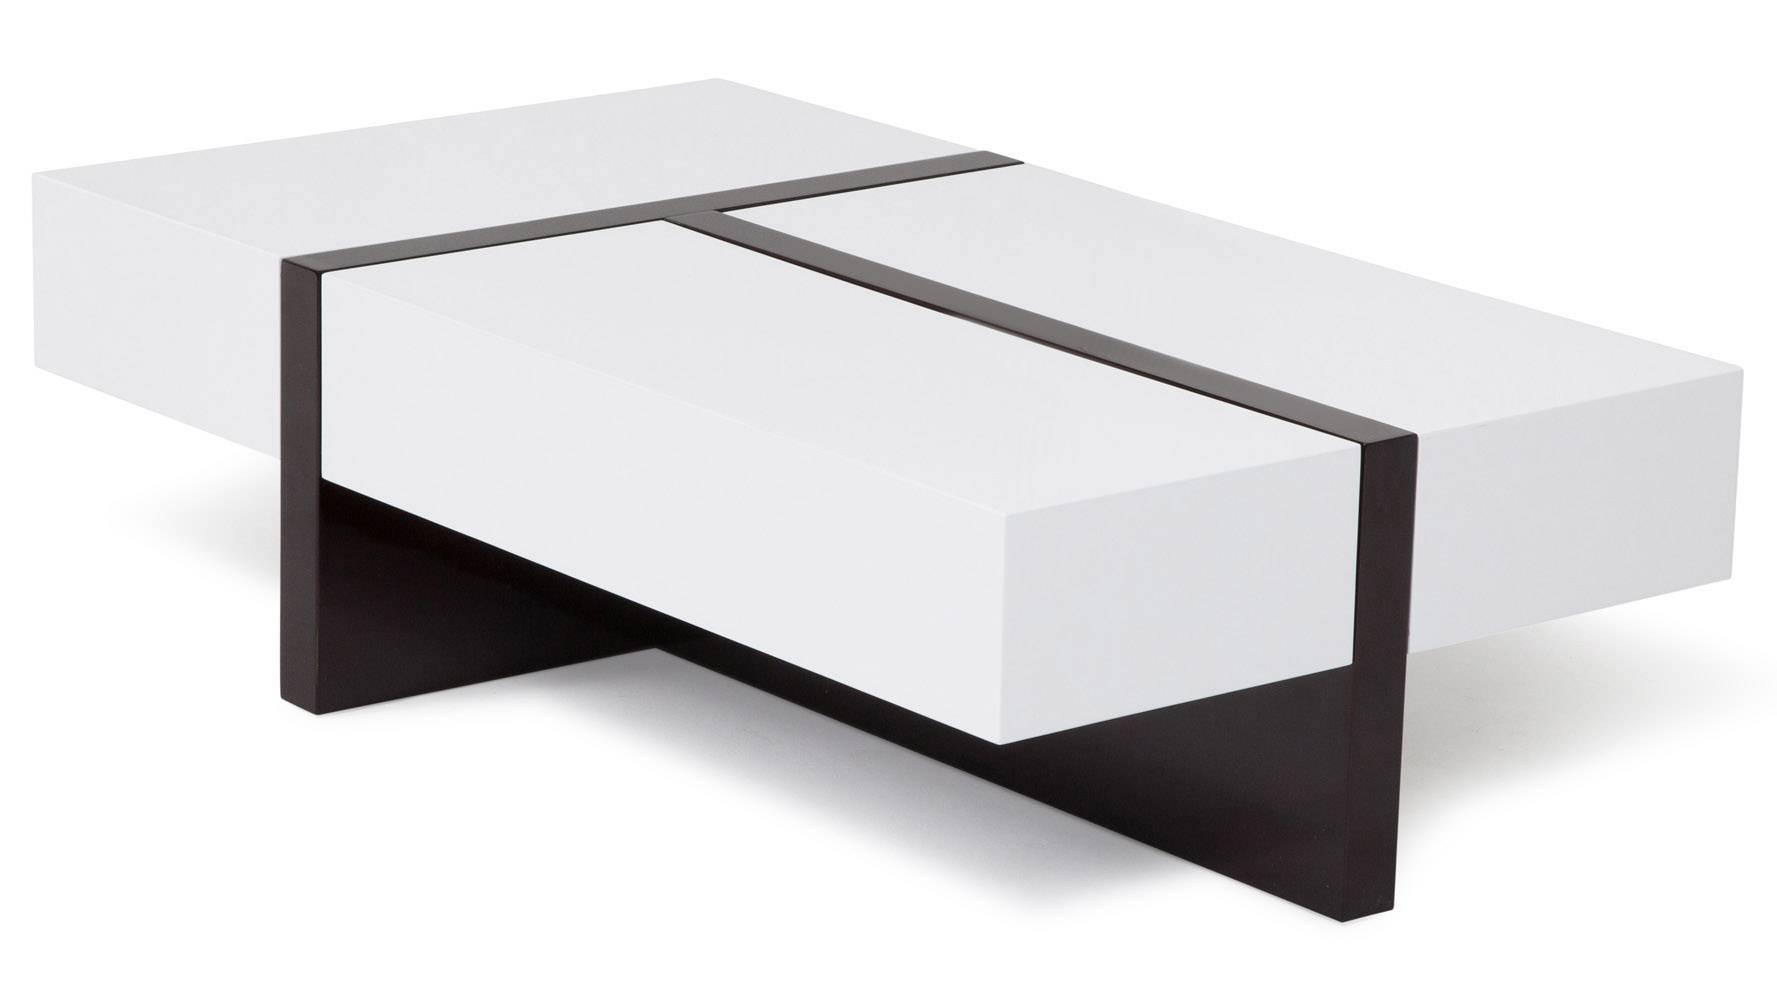 Mcintosh High Gloss Coffee Table With Storage - White Rectangle with High Gloss Coffee Tables (Image 16 of 30)